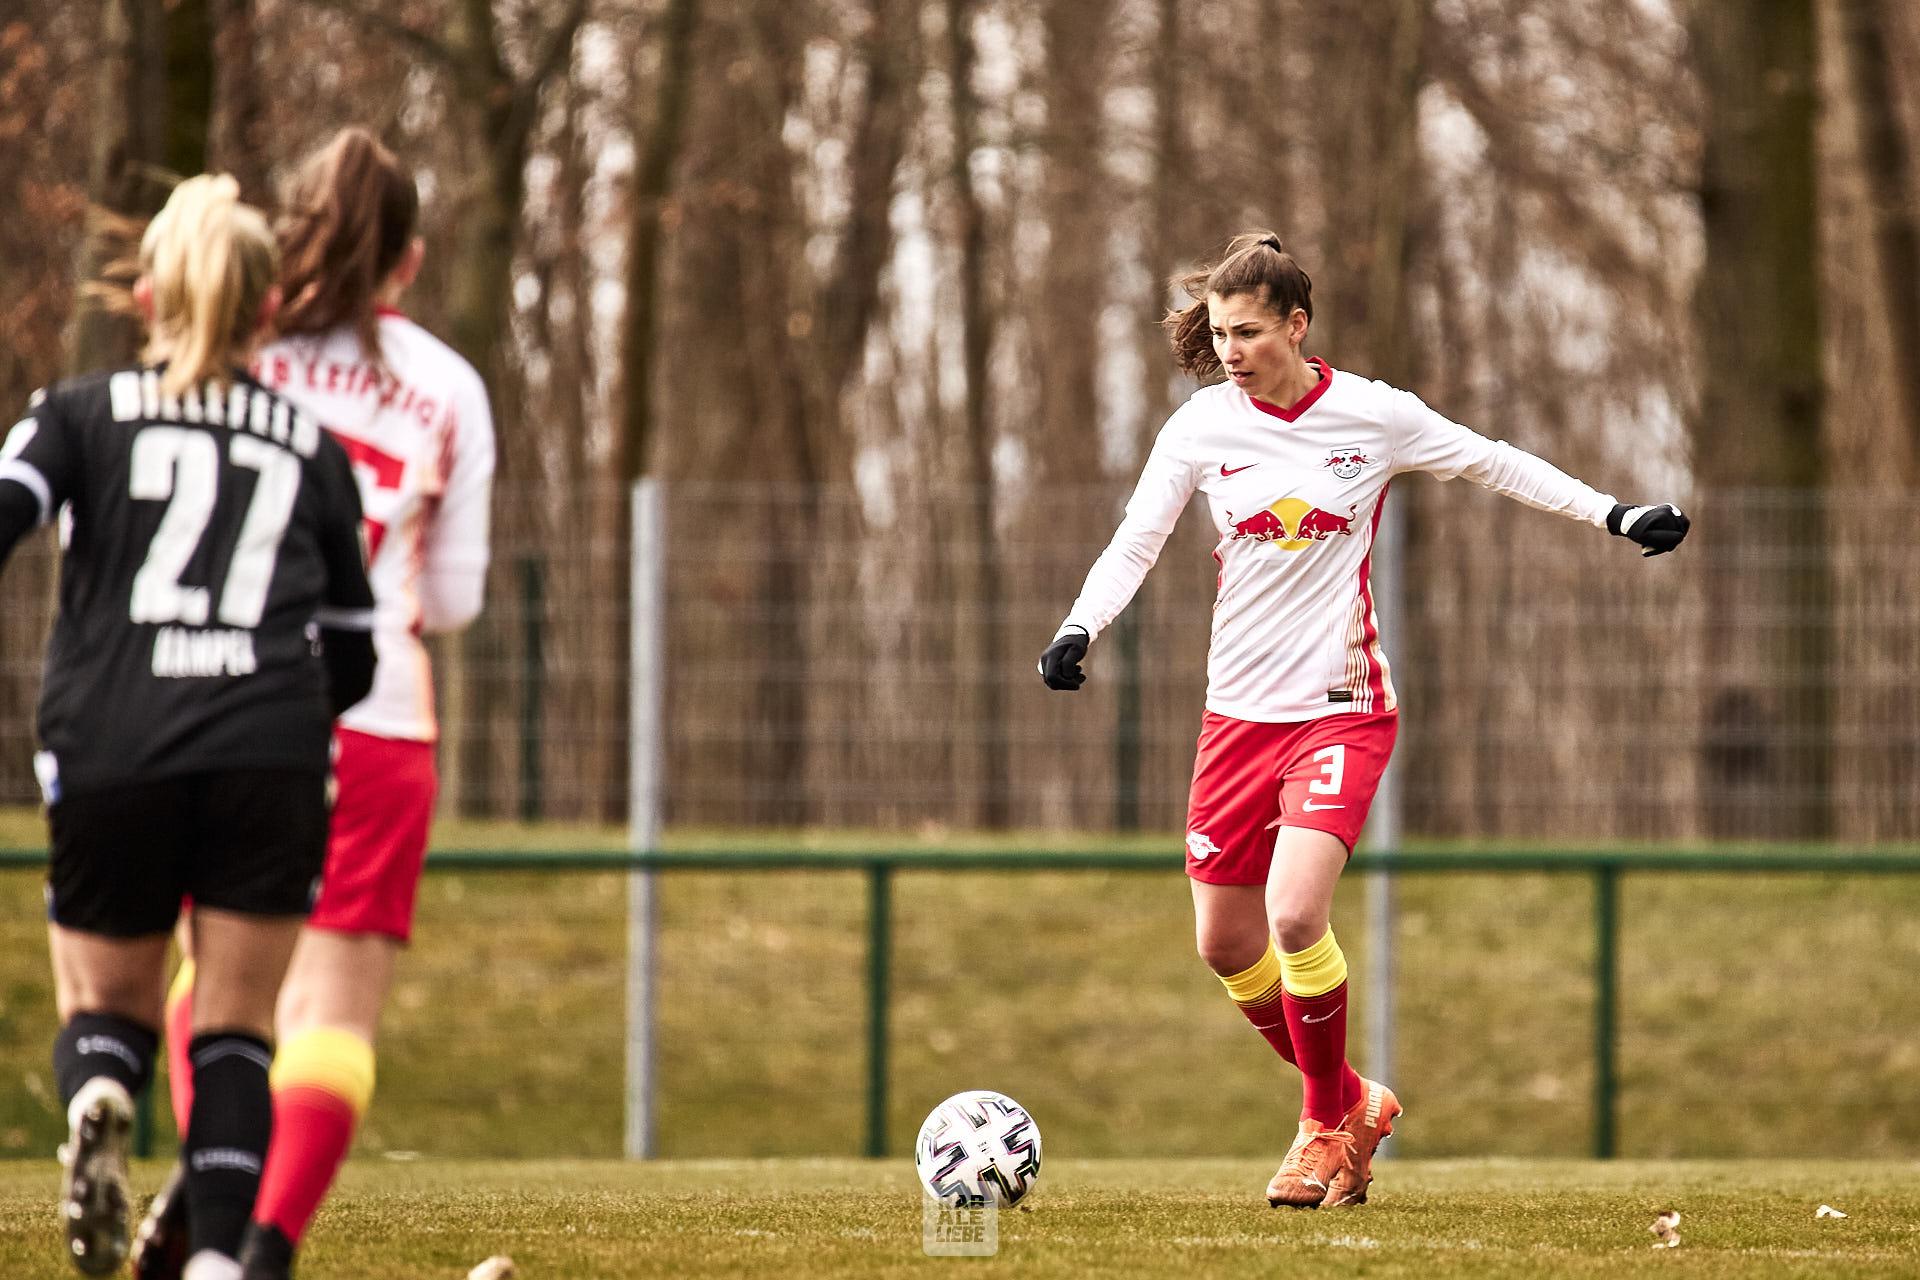 2. Frauenbundesliga: RB Leipzig -vs- DSC Arminia Bielefeld